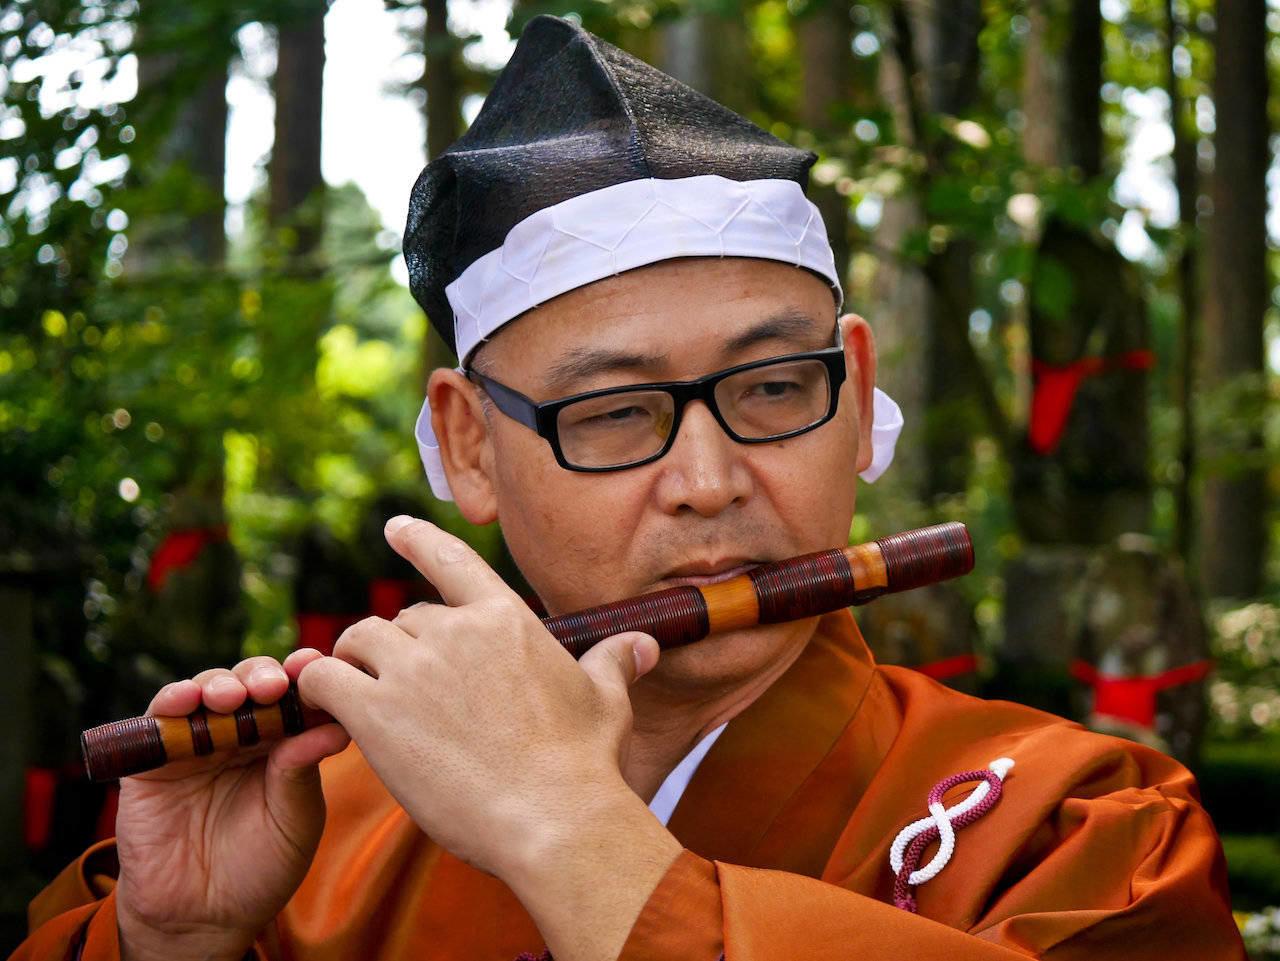 Nunobashi Kanjoe musician